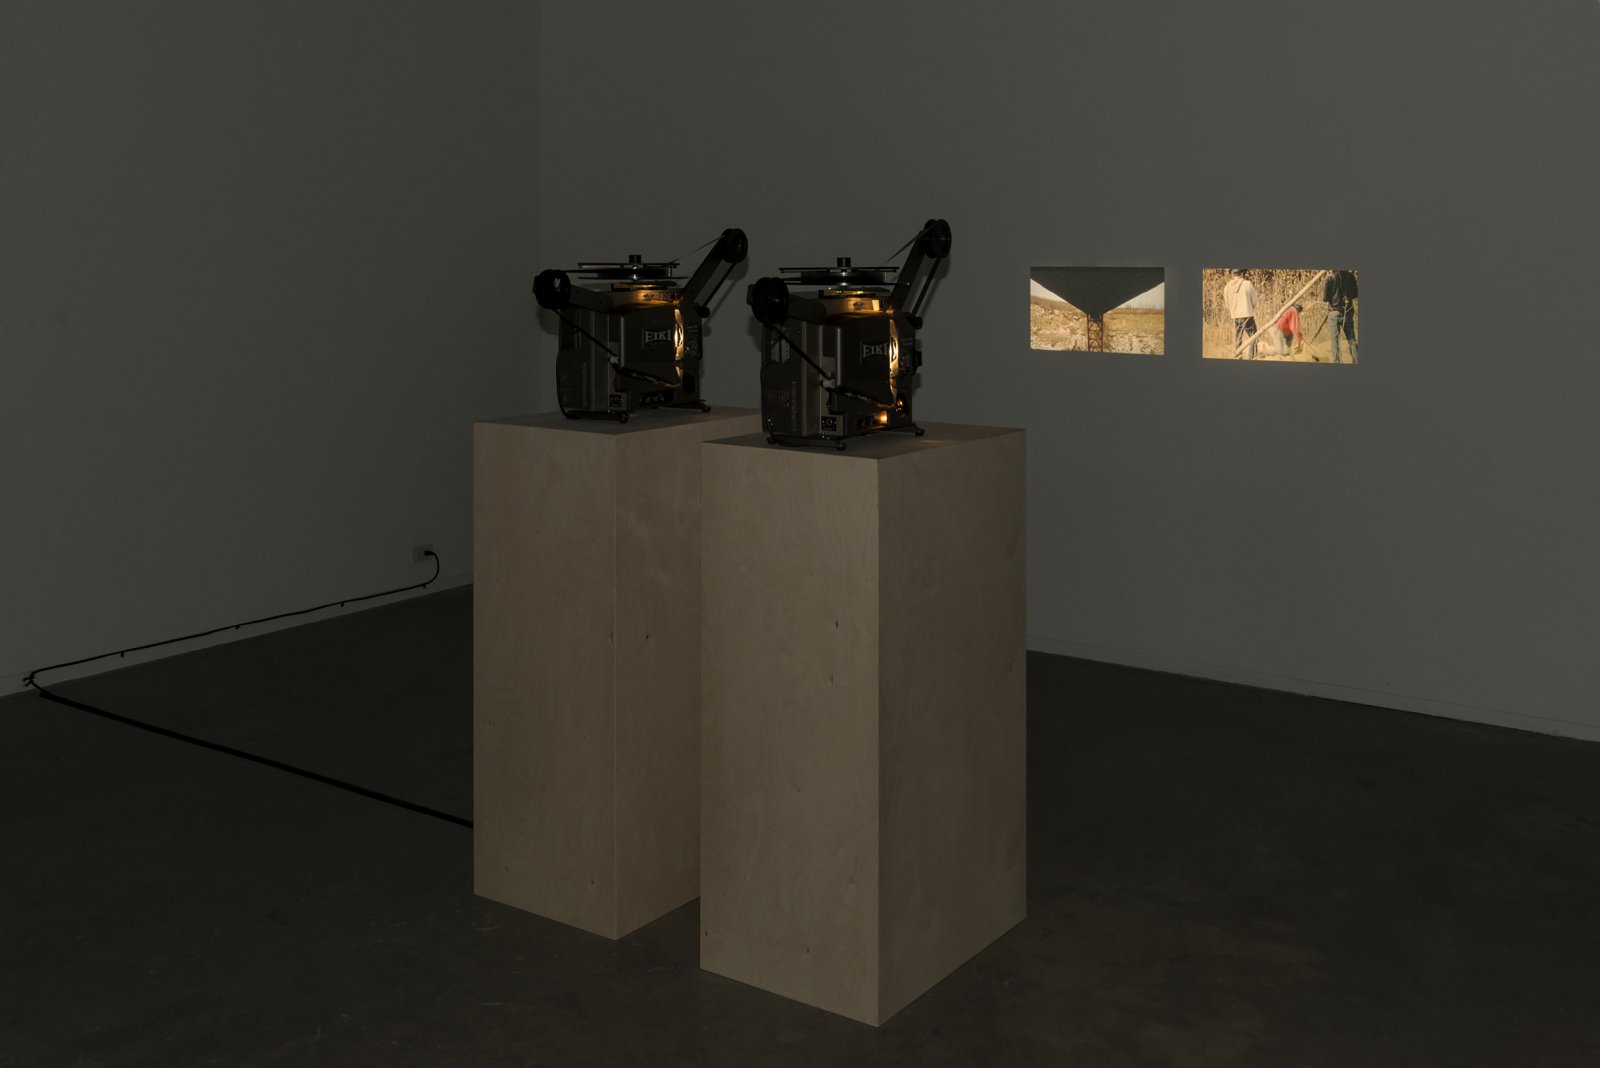 Brian Jungen and Duane Linklater,Lean, 2012, super 16mm film loop on projector,10 minutes